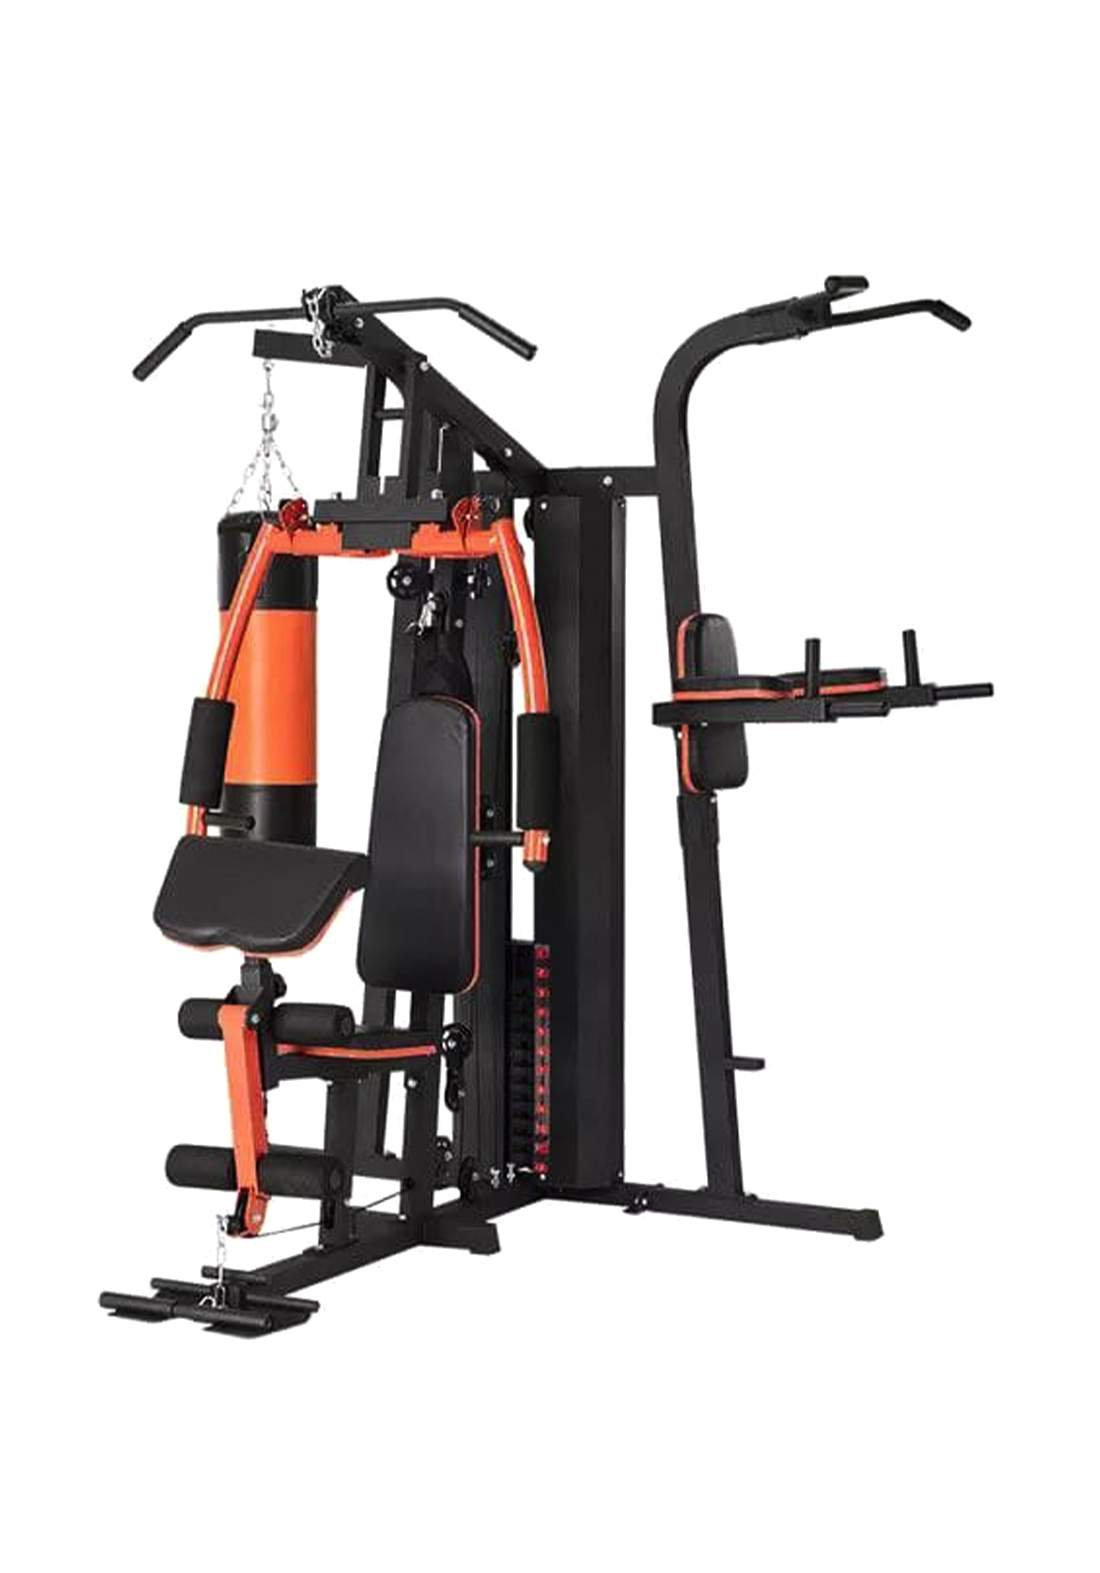 Home Gym جهاز التمارين الرياضية